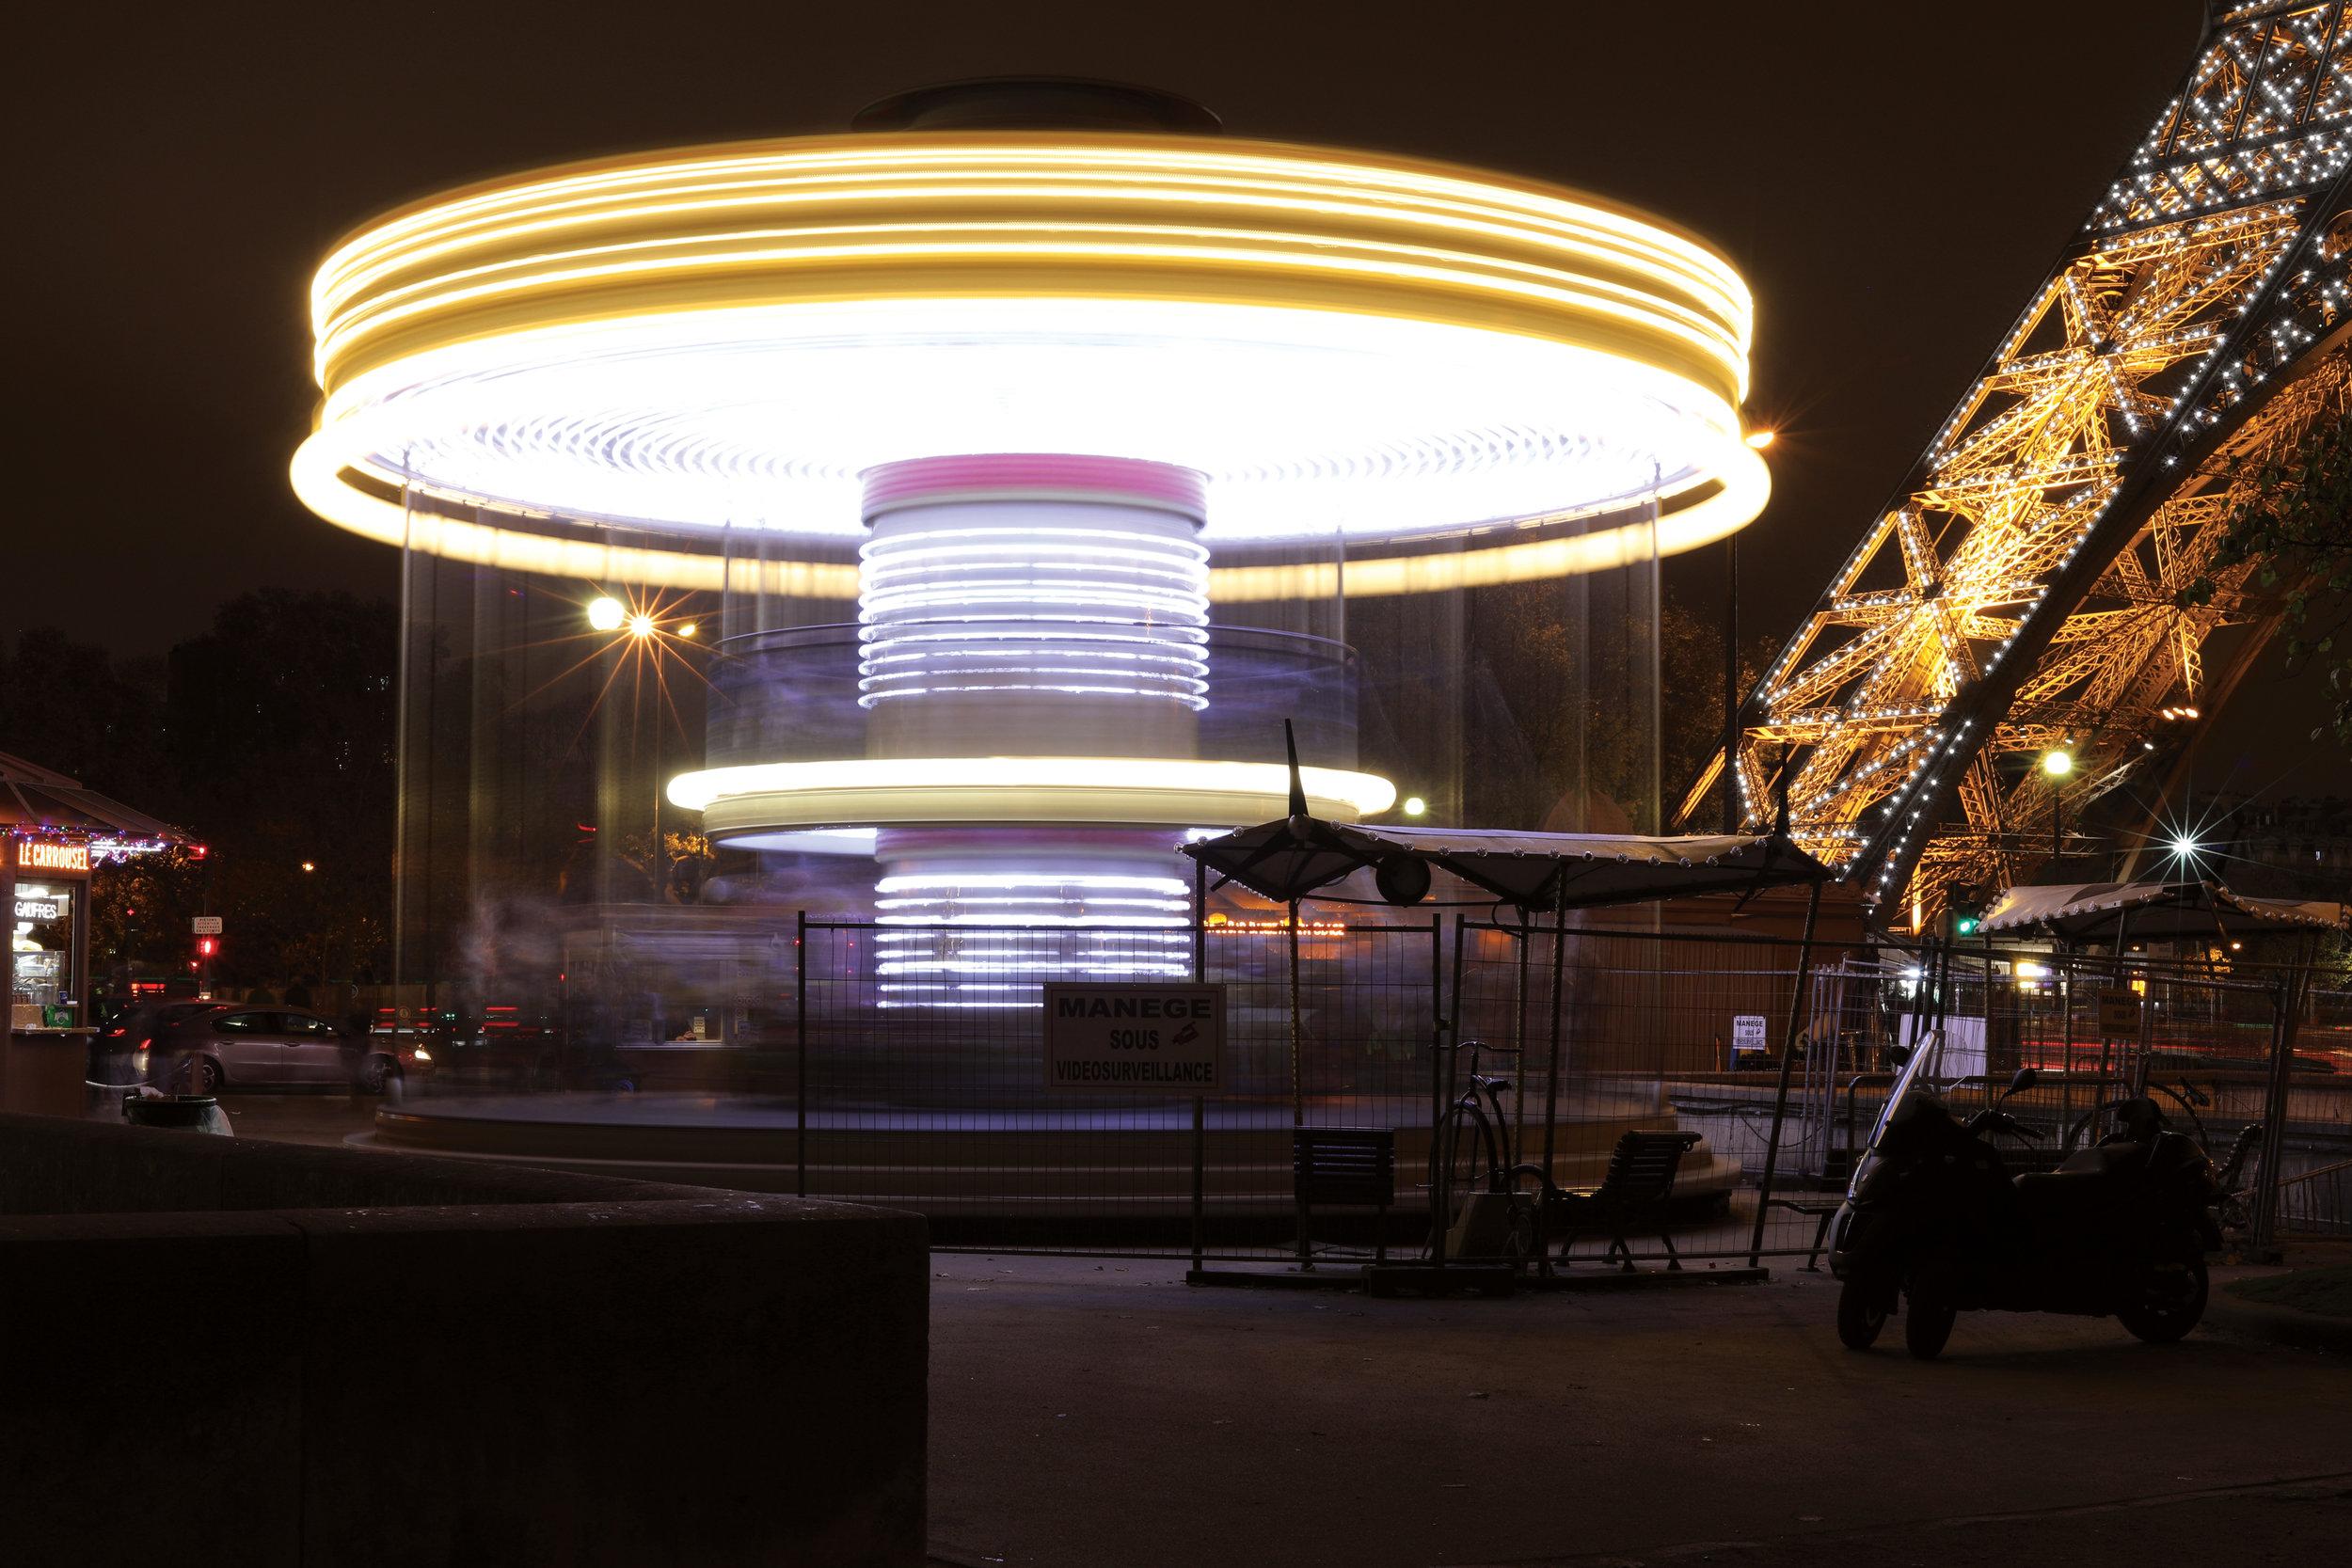 Merry-Go-Round nest to the Eiffel Tower, Paris, France   https://www.ebay.com/itm/263679754345?ssPageName=STRK:MESELX:IT&_trksid=p3984.m1555.l2649